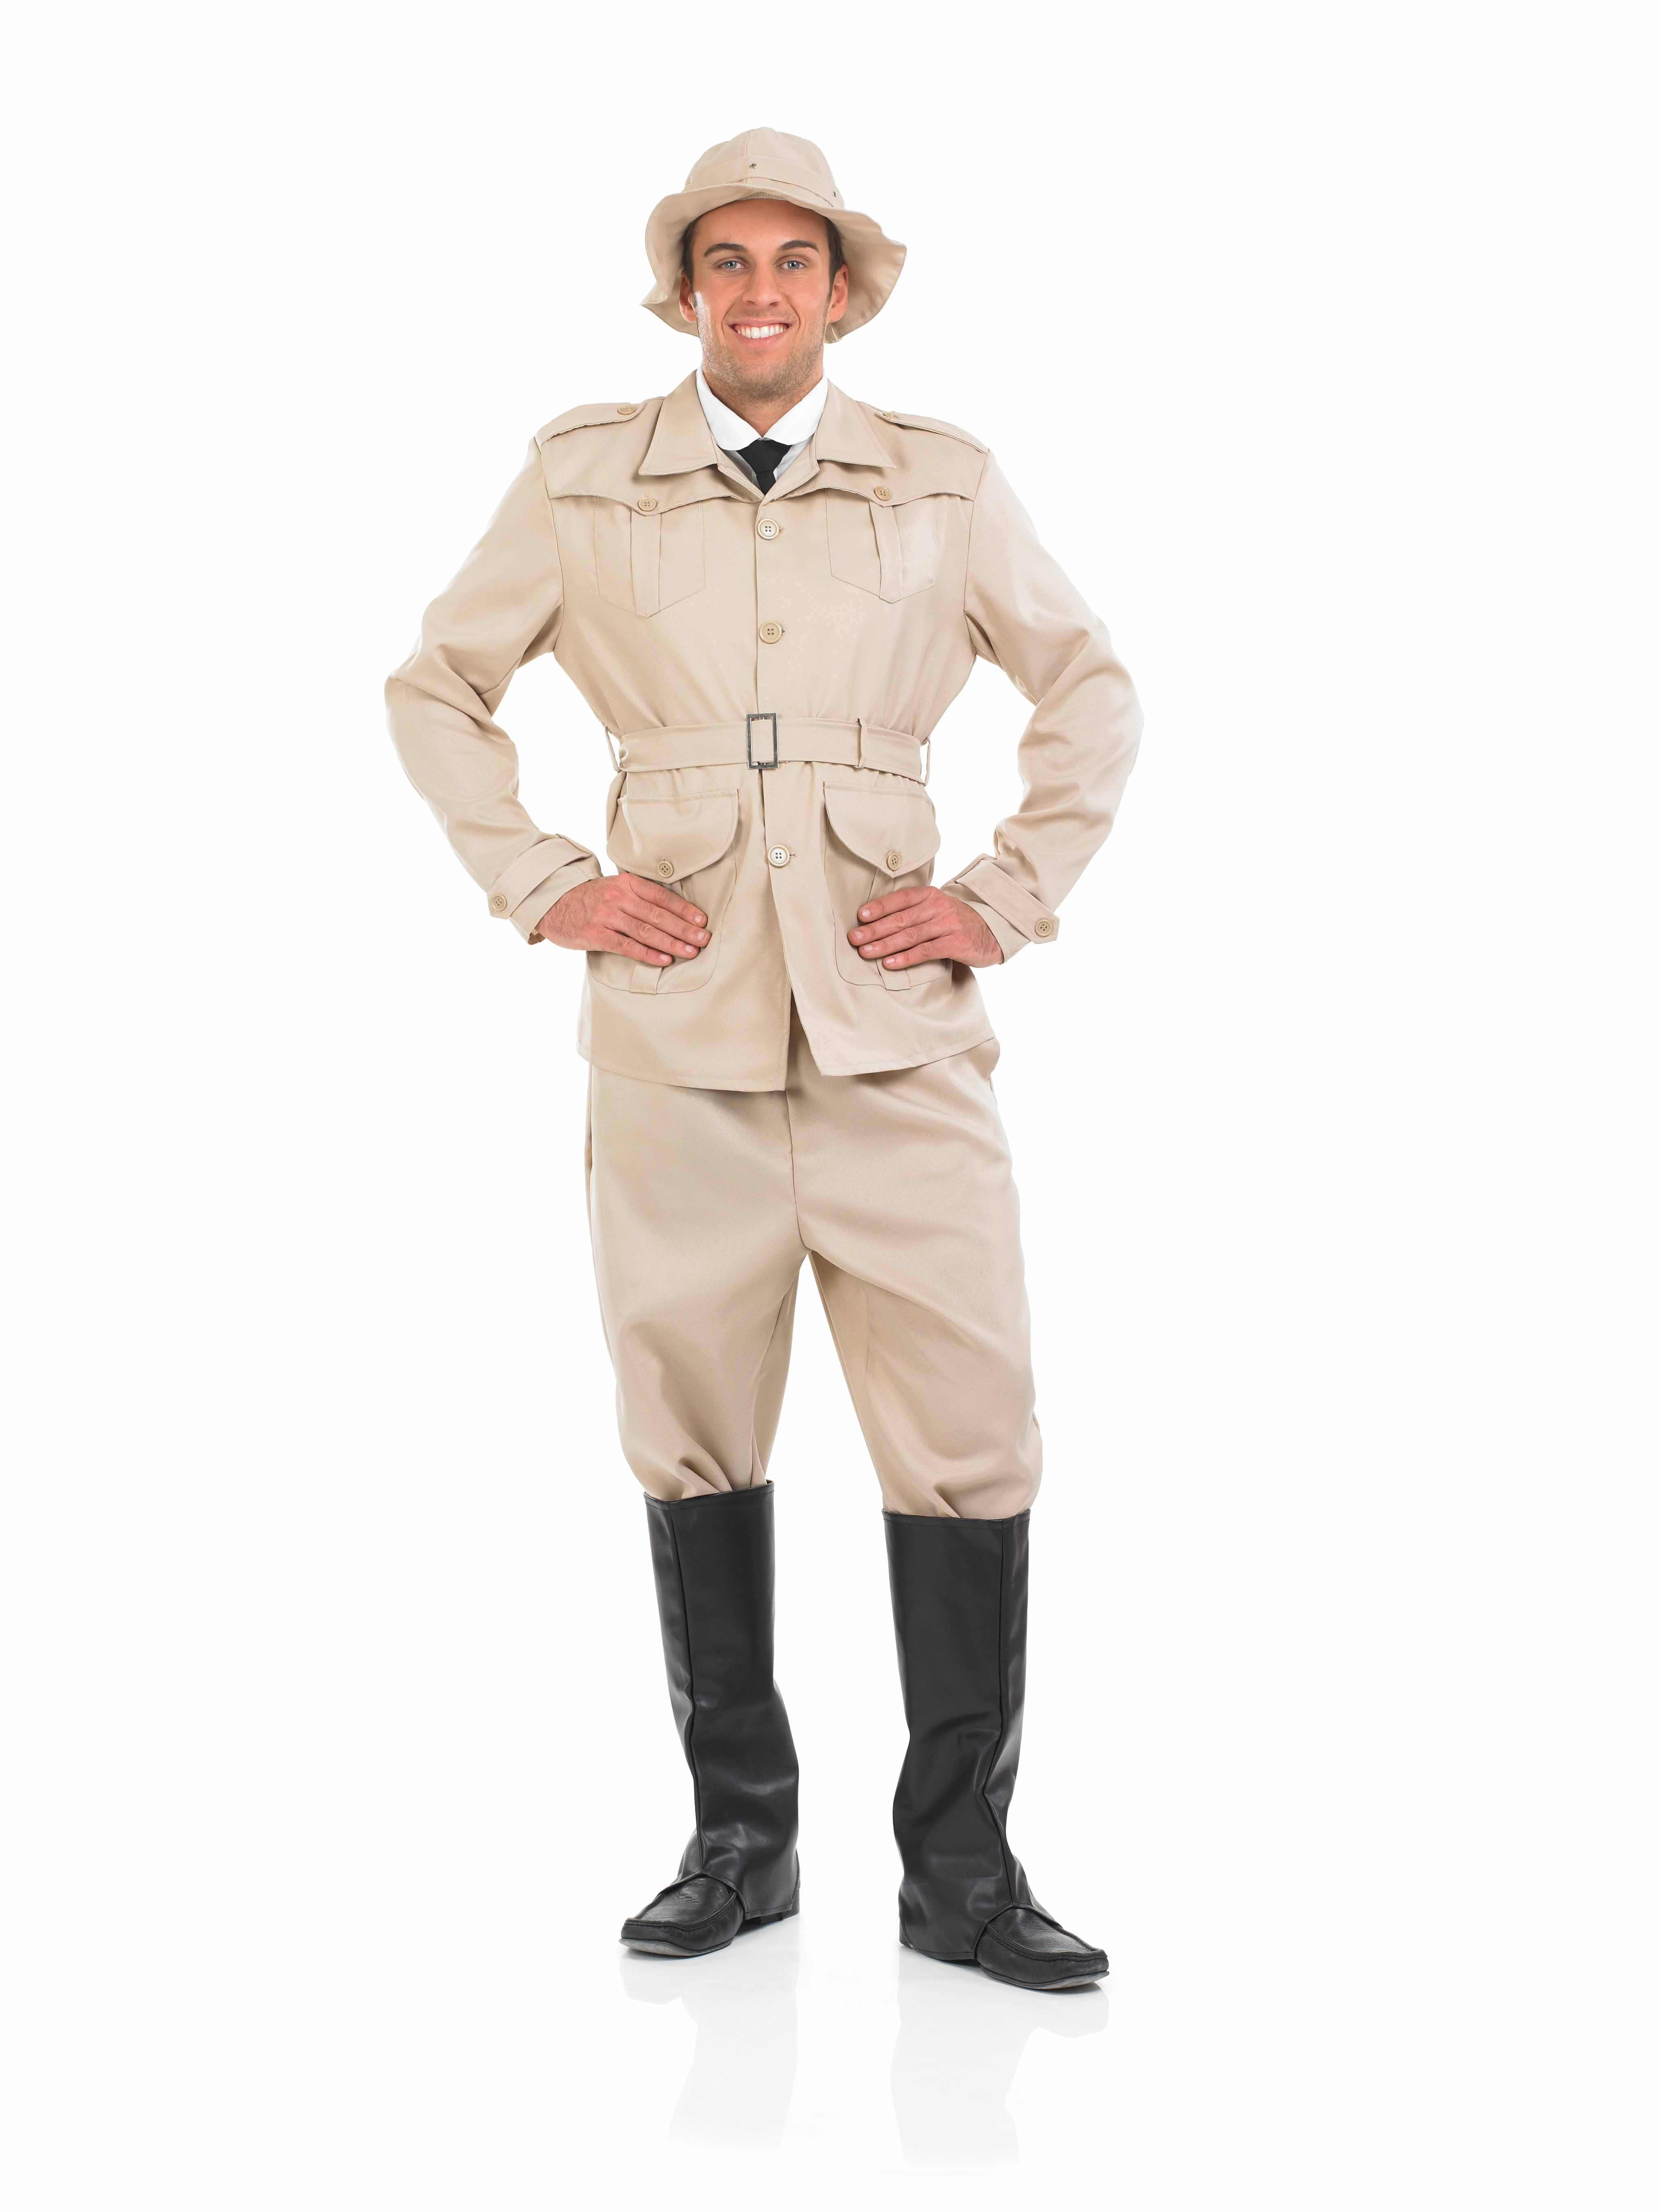 Mens-Safari-Suit-Costume-For-Jungle-Fancy-Dress-  sc 1 st  eBay & Mens Safari Suit Costume For Jungle Fancy Dress Adults Male | eBay